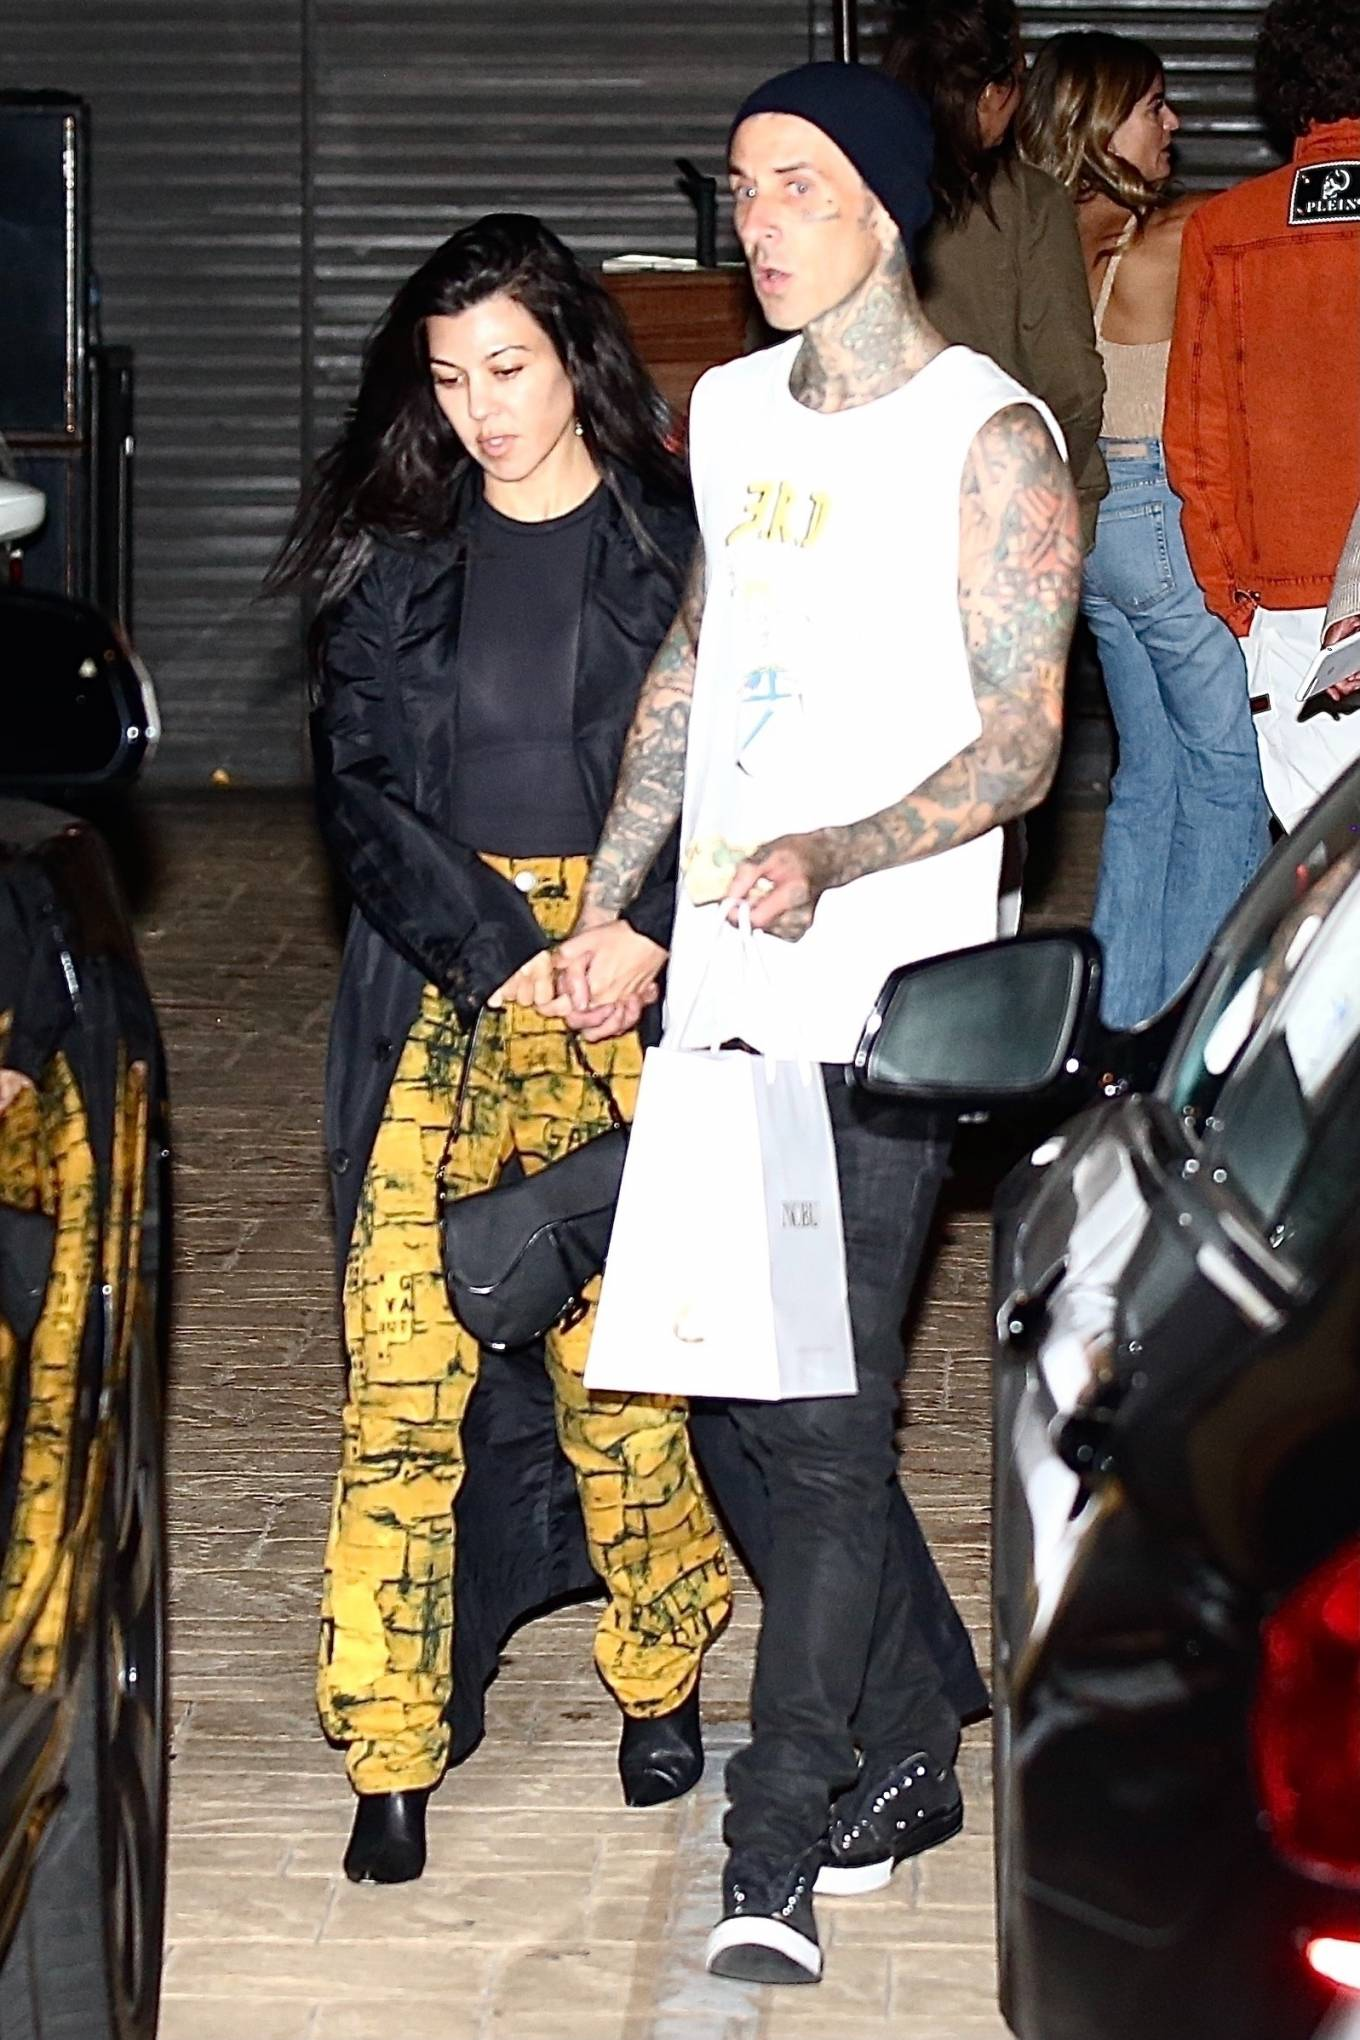 Kourtney Kardashian - With boyfriend Travis Barker seen at Nobu in Malibu